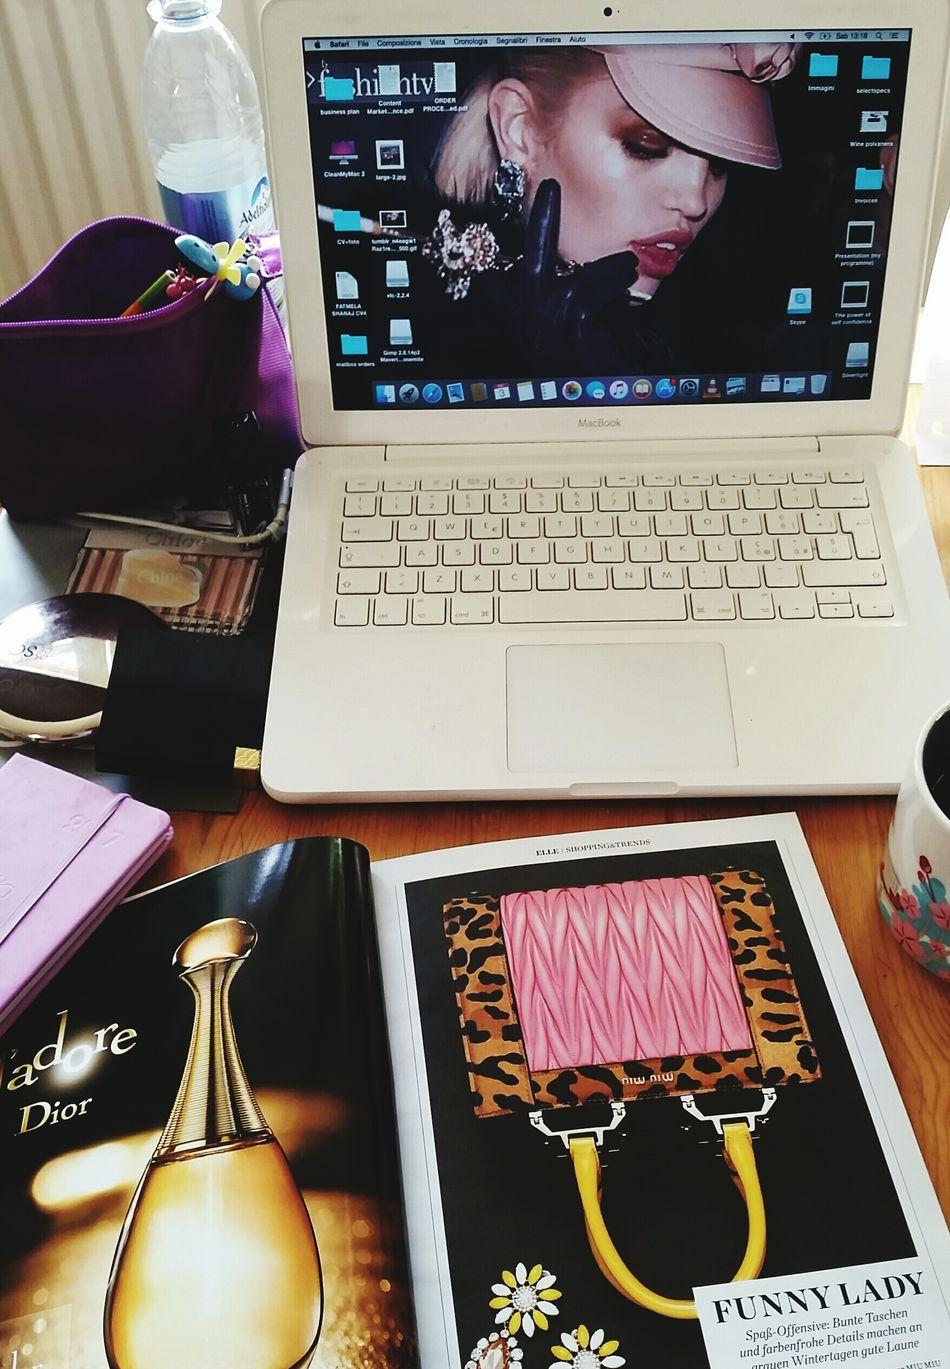 Desk Fashiondesk Fashionjob Fashionphotography Inspirations Everywhere. Fashionblogger Workingdesk Working Hard